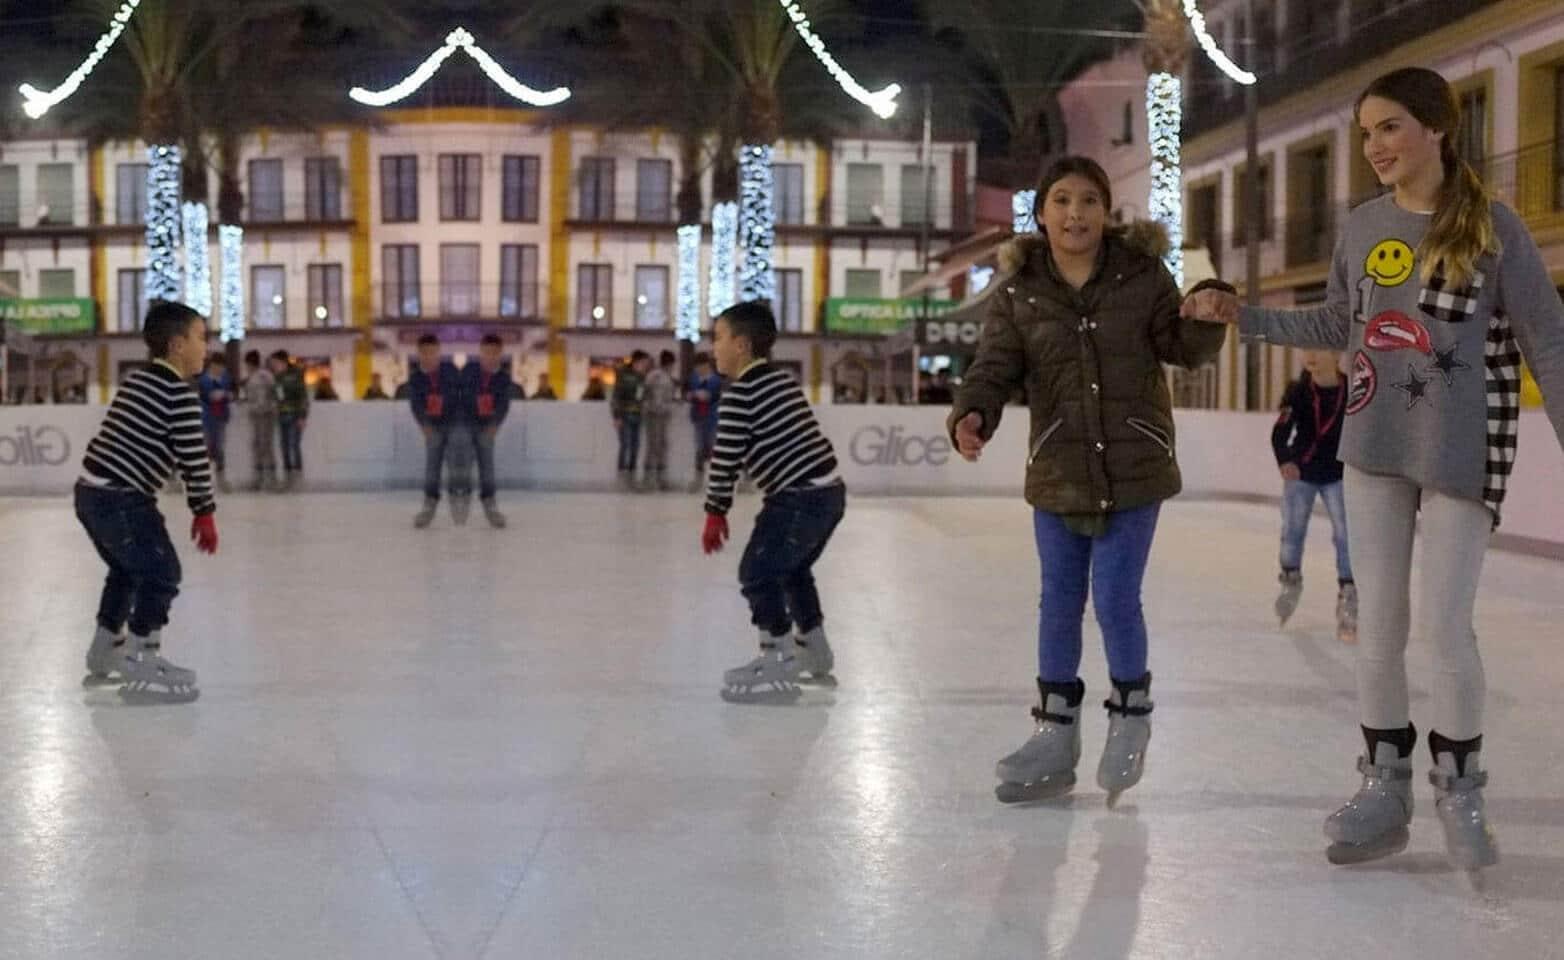 Christmas season on a plastic ice rink in Spain